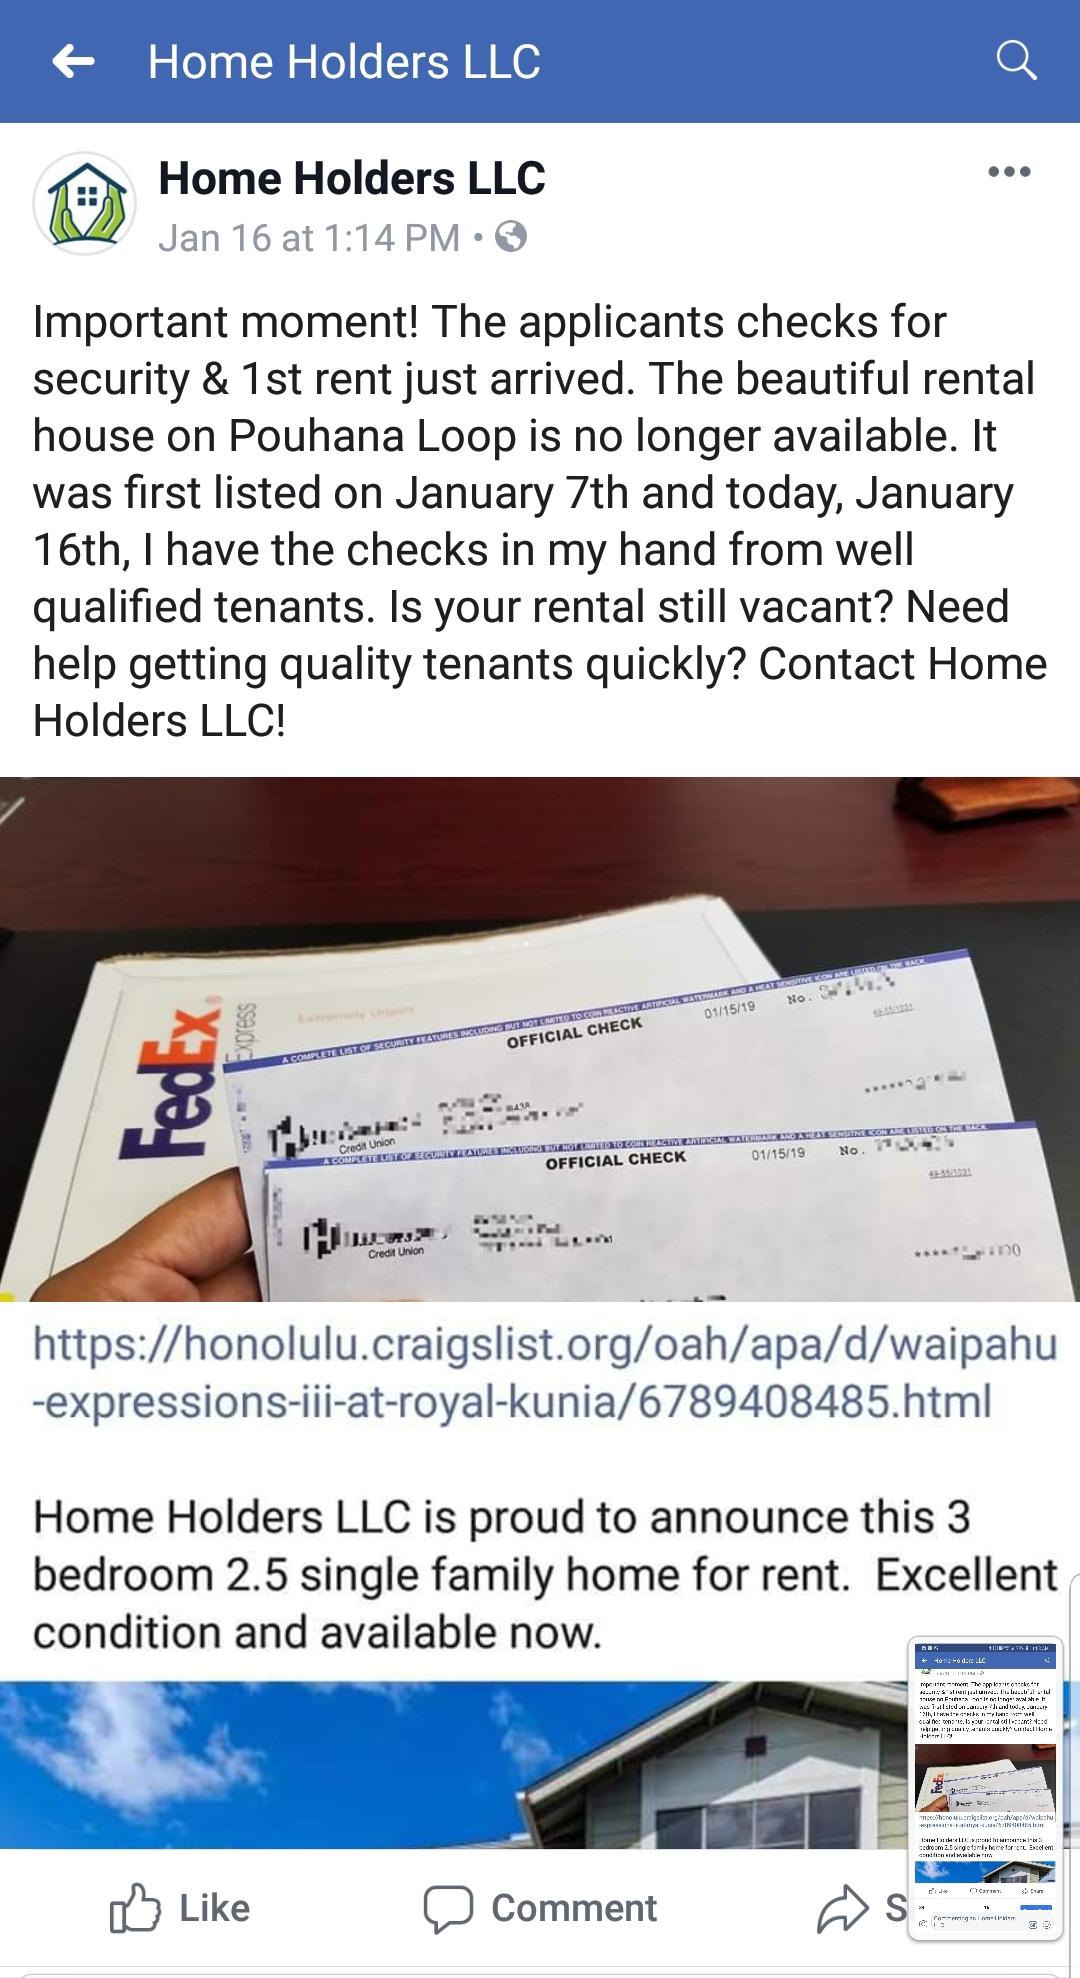 Home Holders LLC image 6